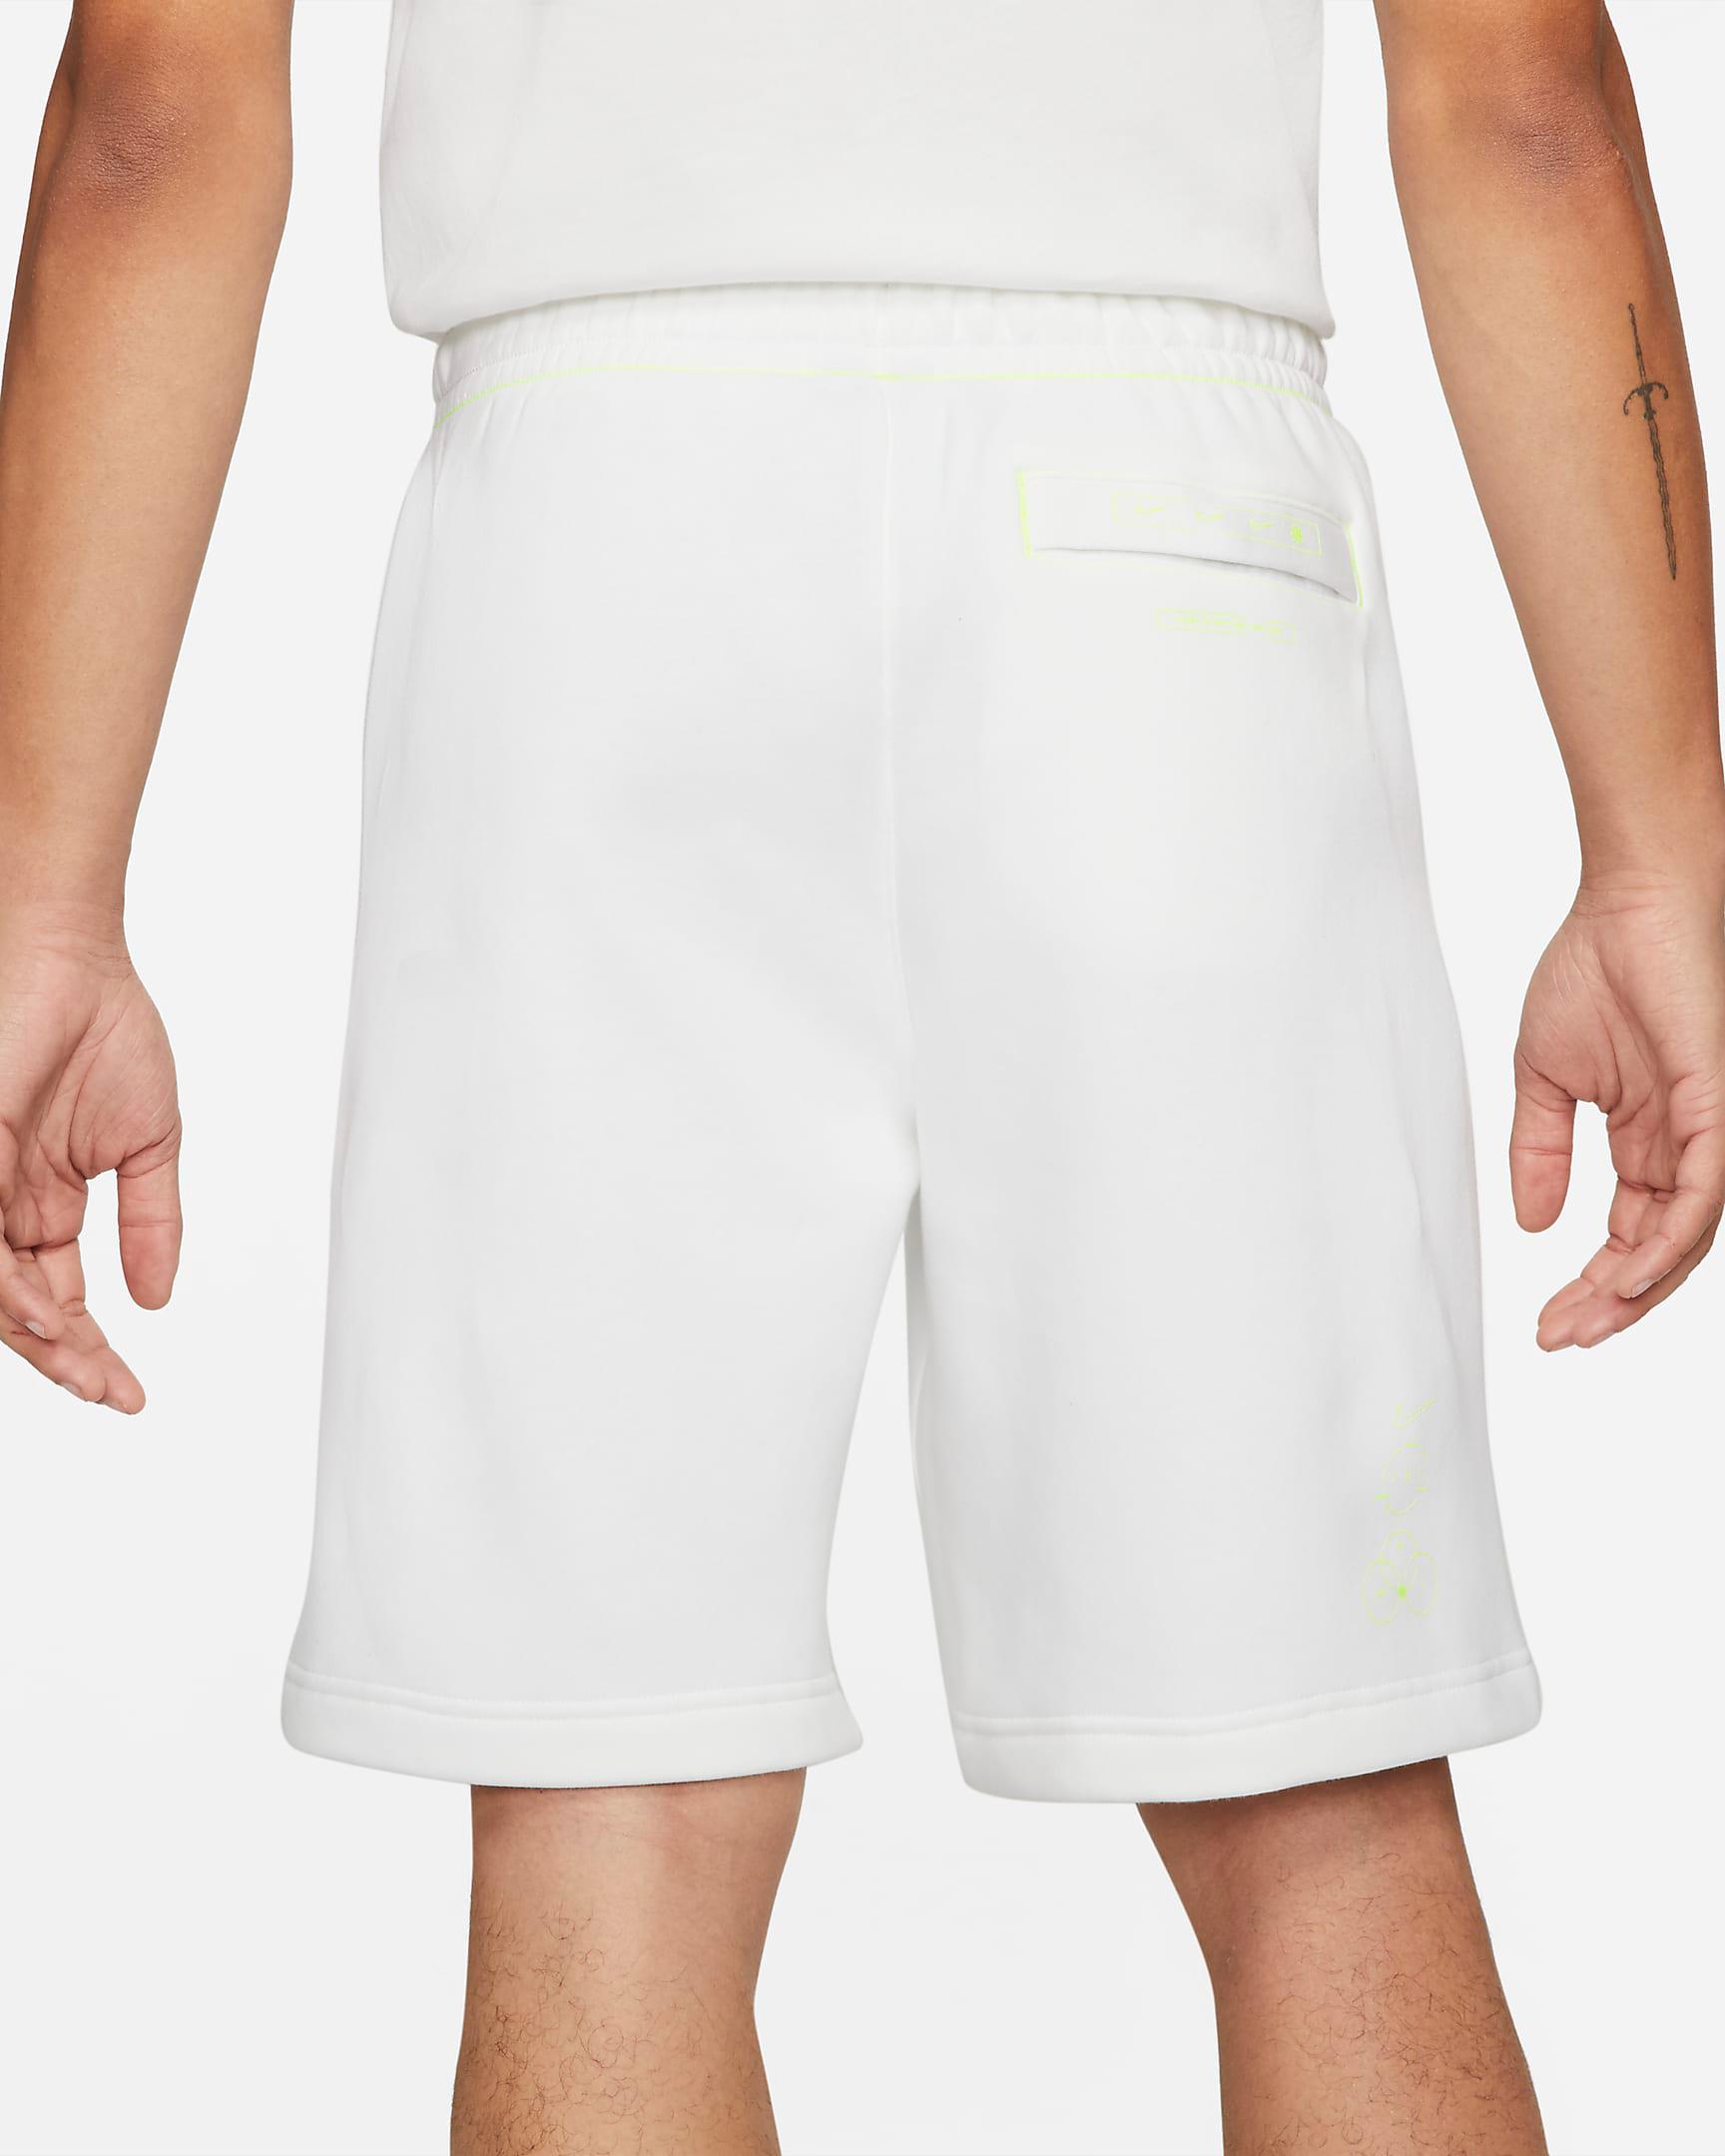 nike-club-fleece-shorts-white-volt-3